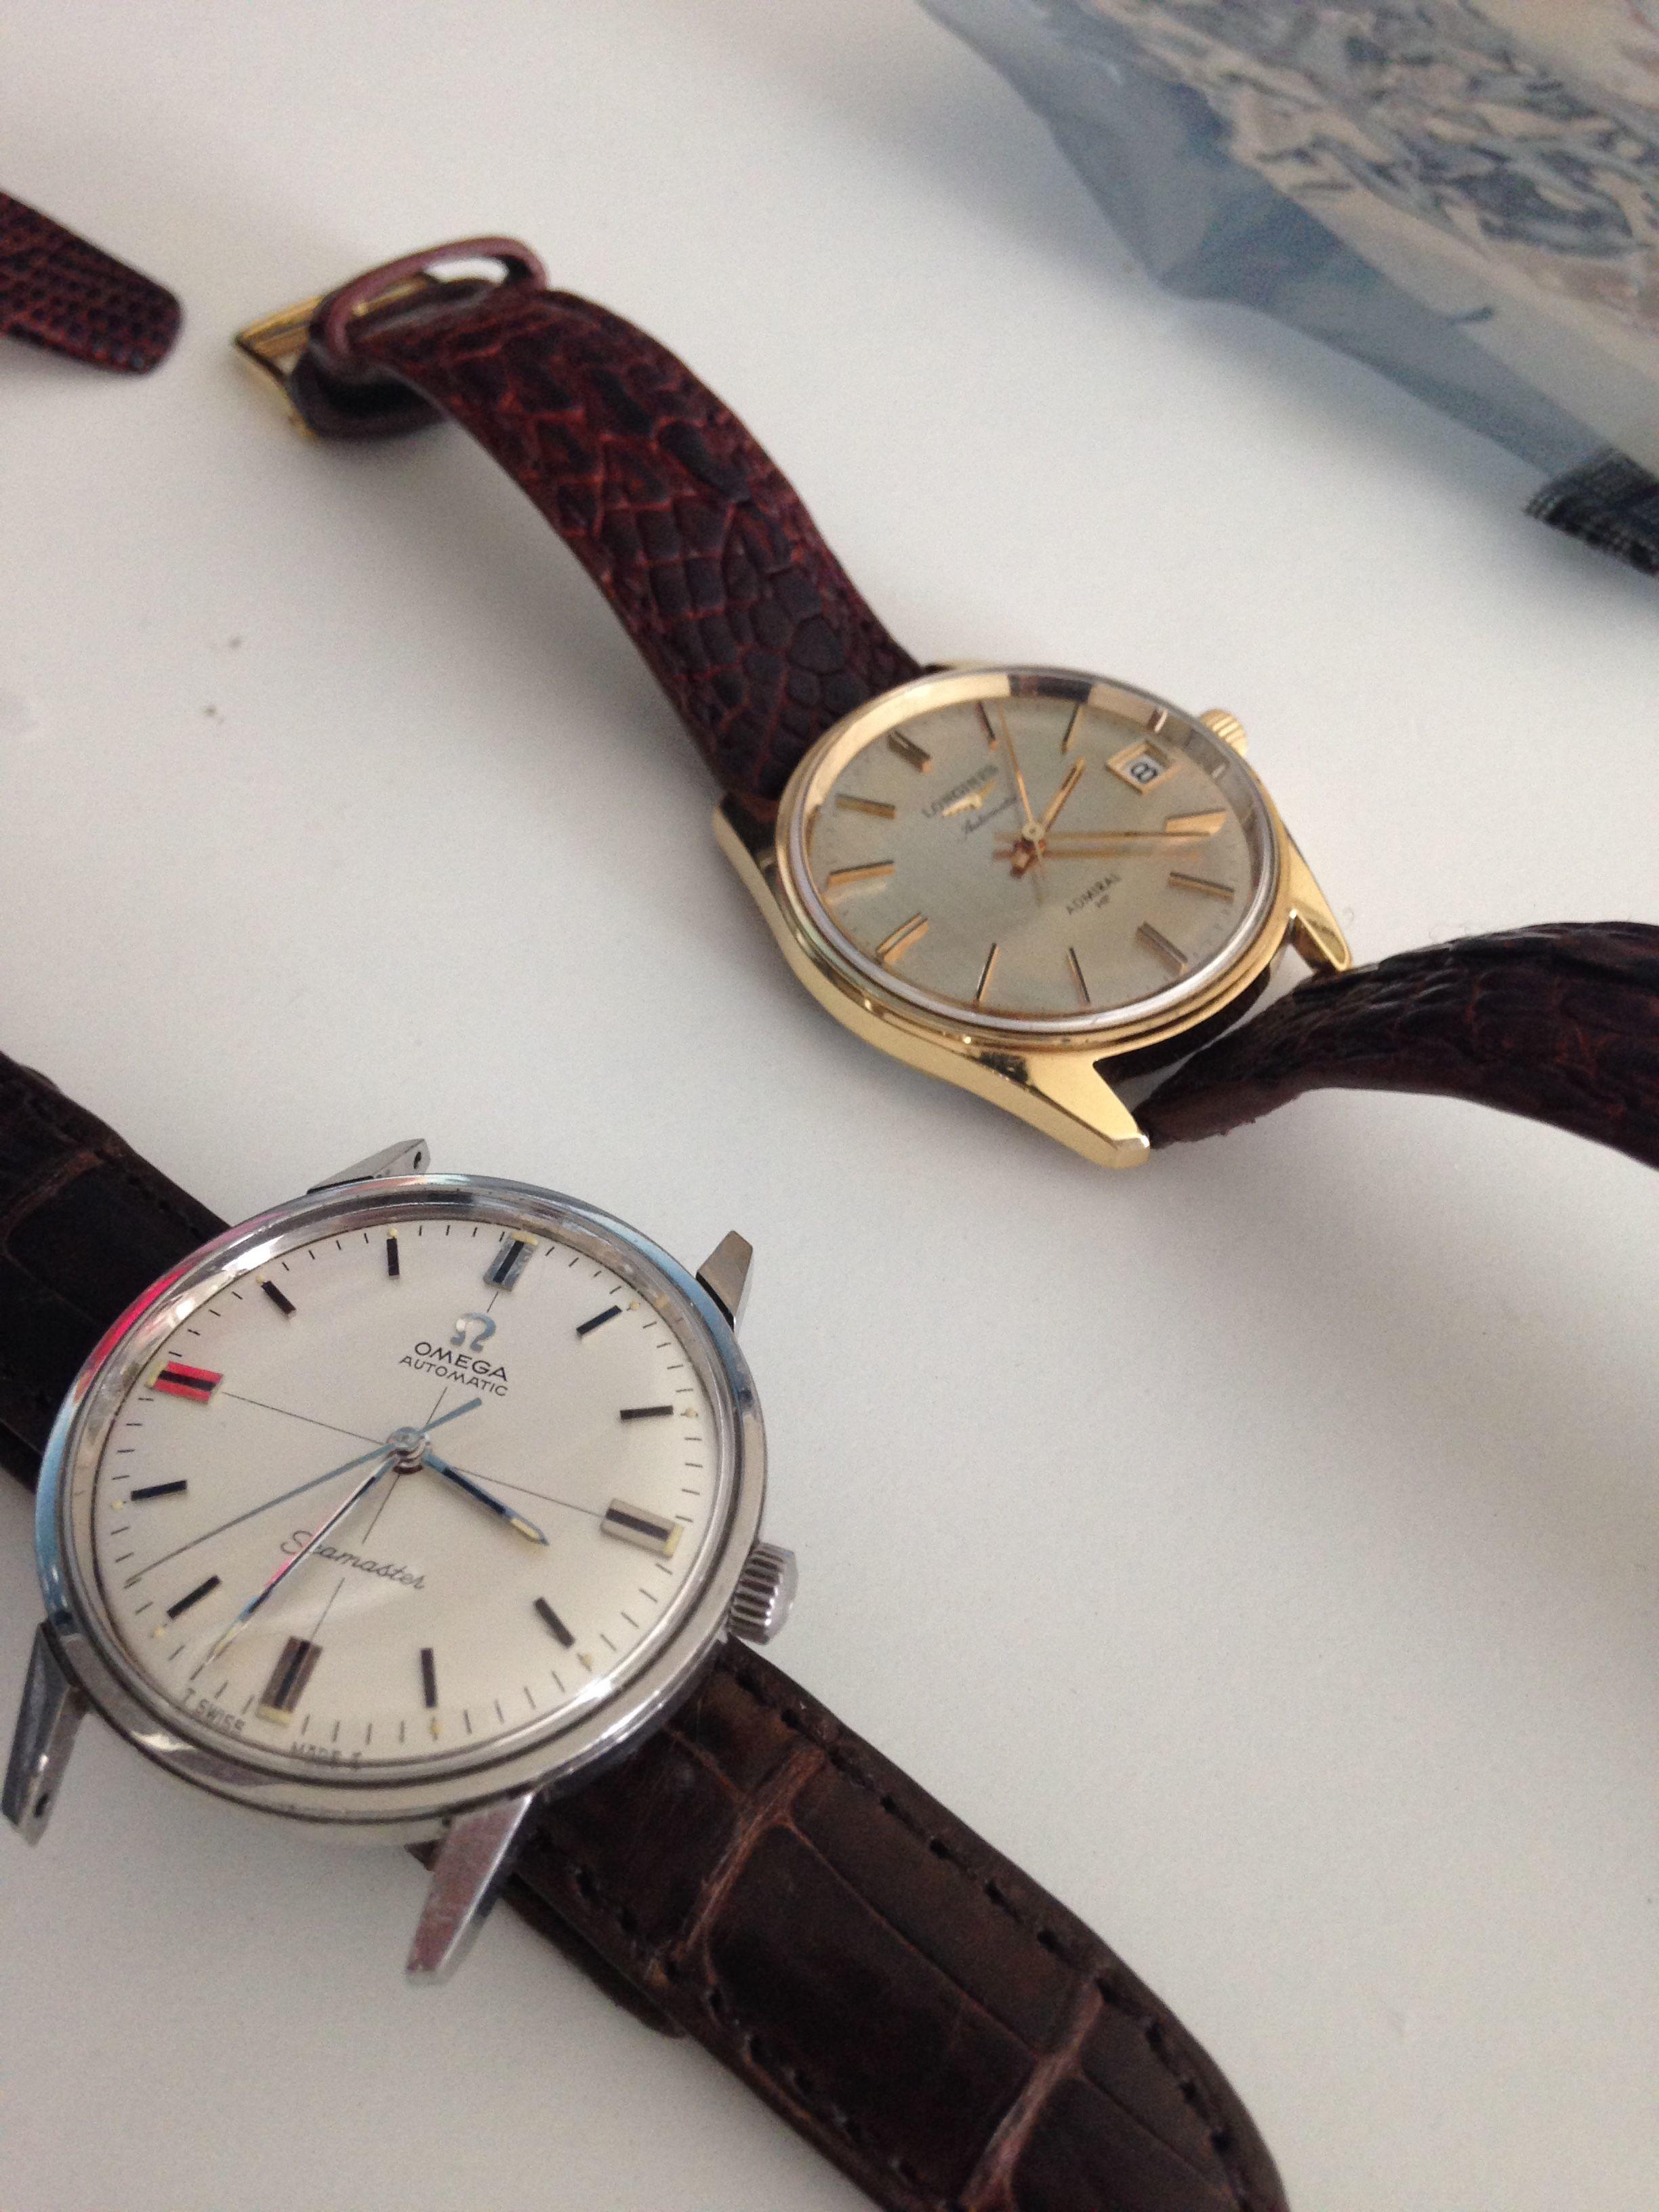 Beginneling83's photos in The Watch Appreciation Thread - Part Three